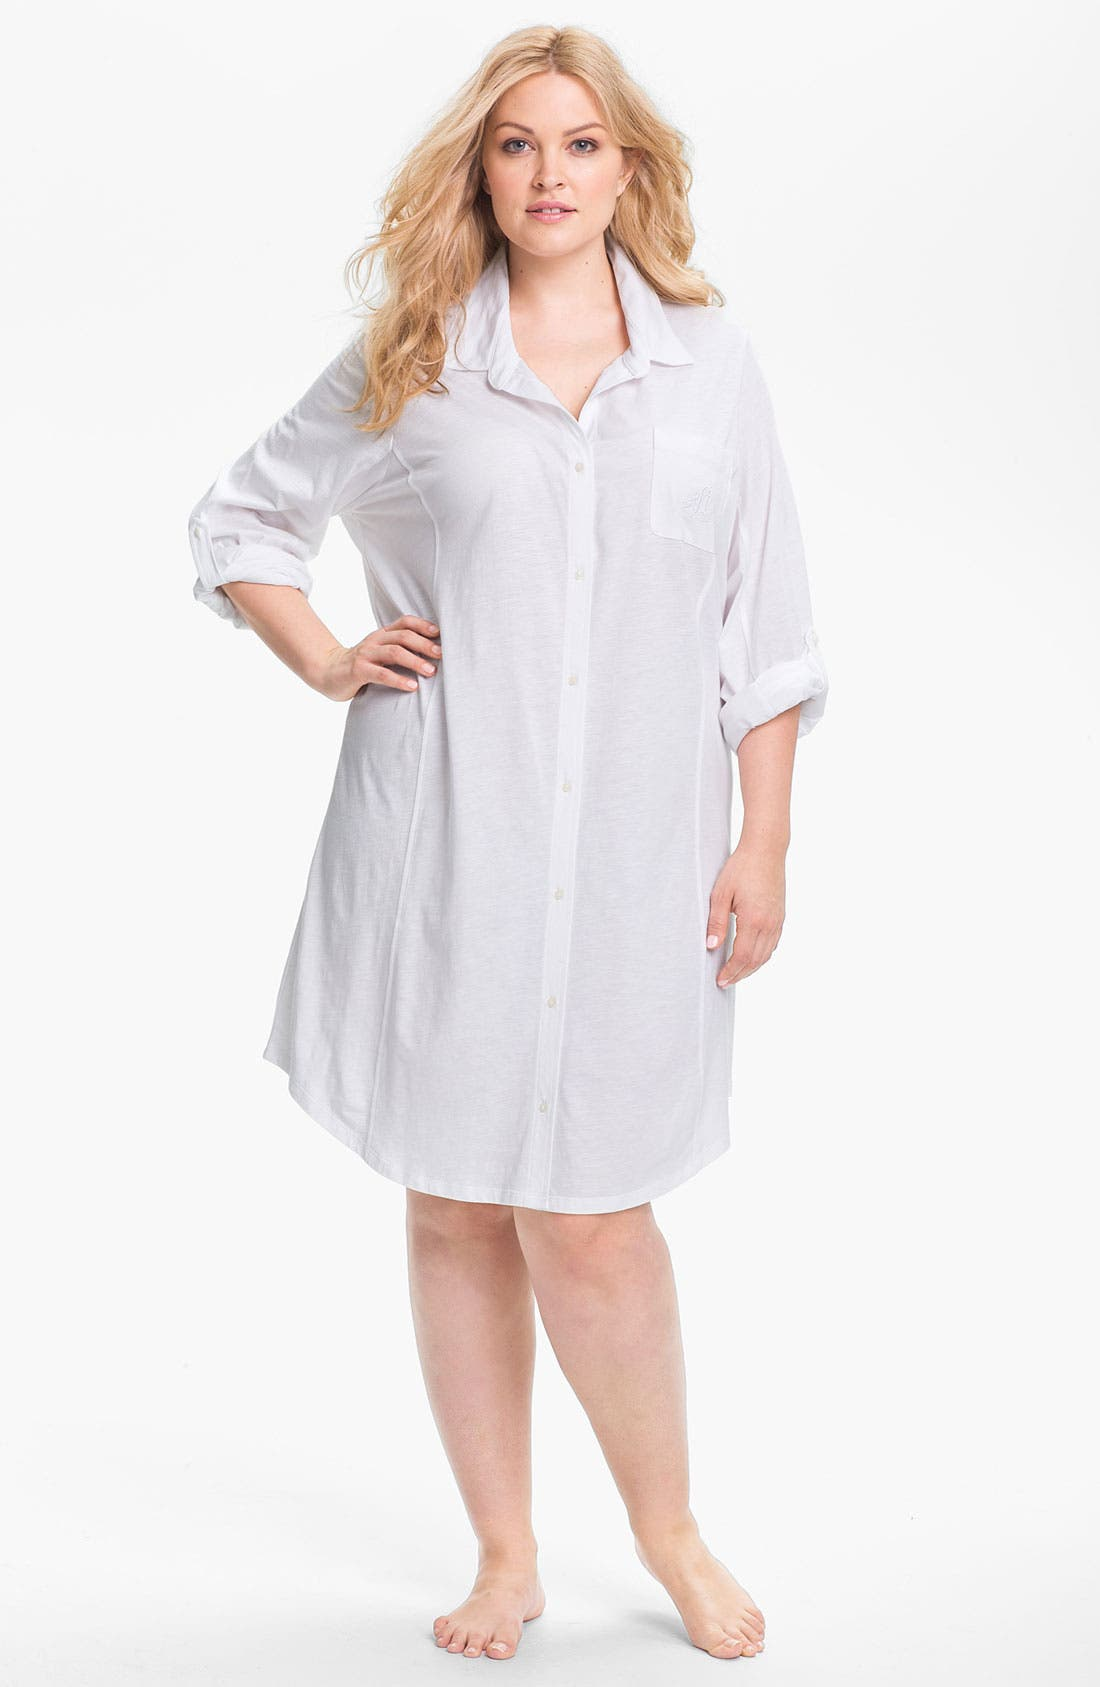 Alternate Image 1 Selected - Lauren Ralph Lauren Sleepwear Knit Nightshirt (Plus)